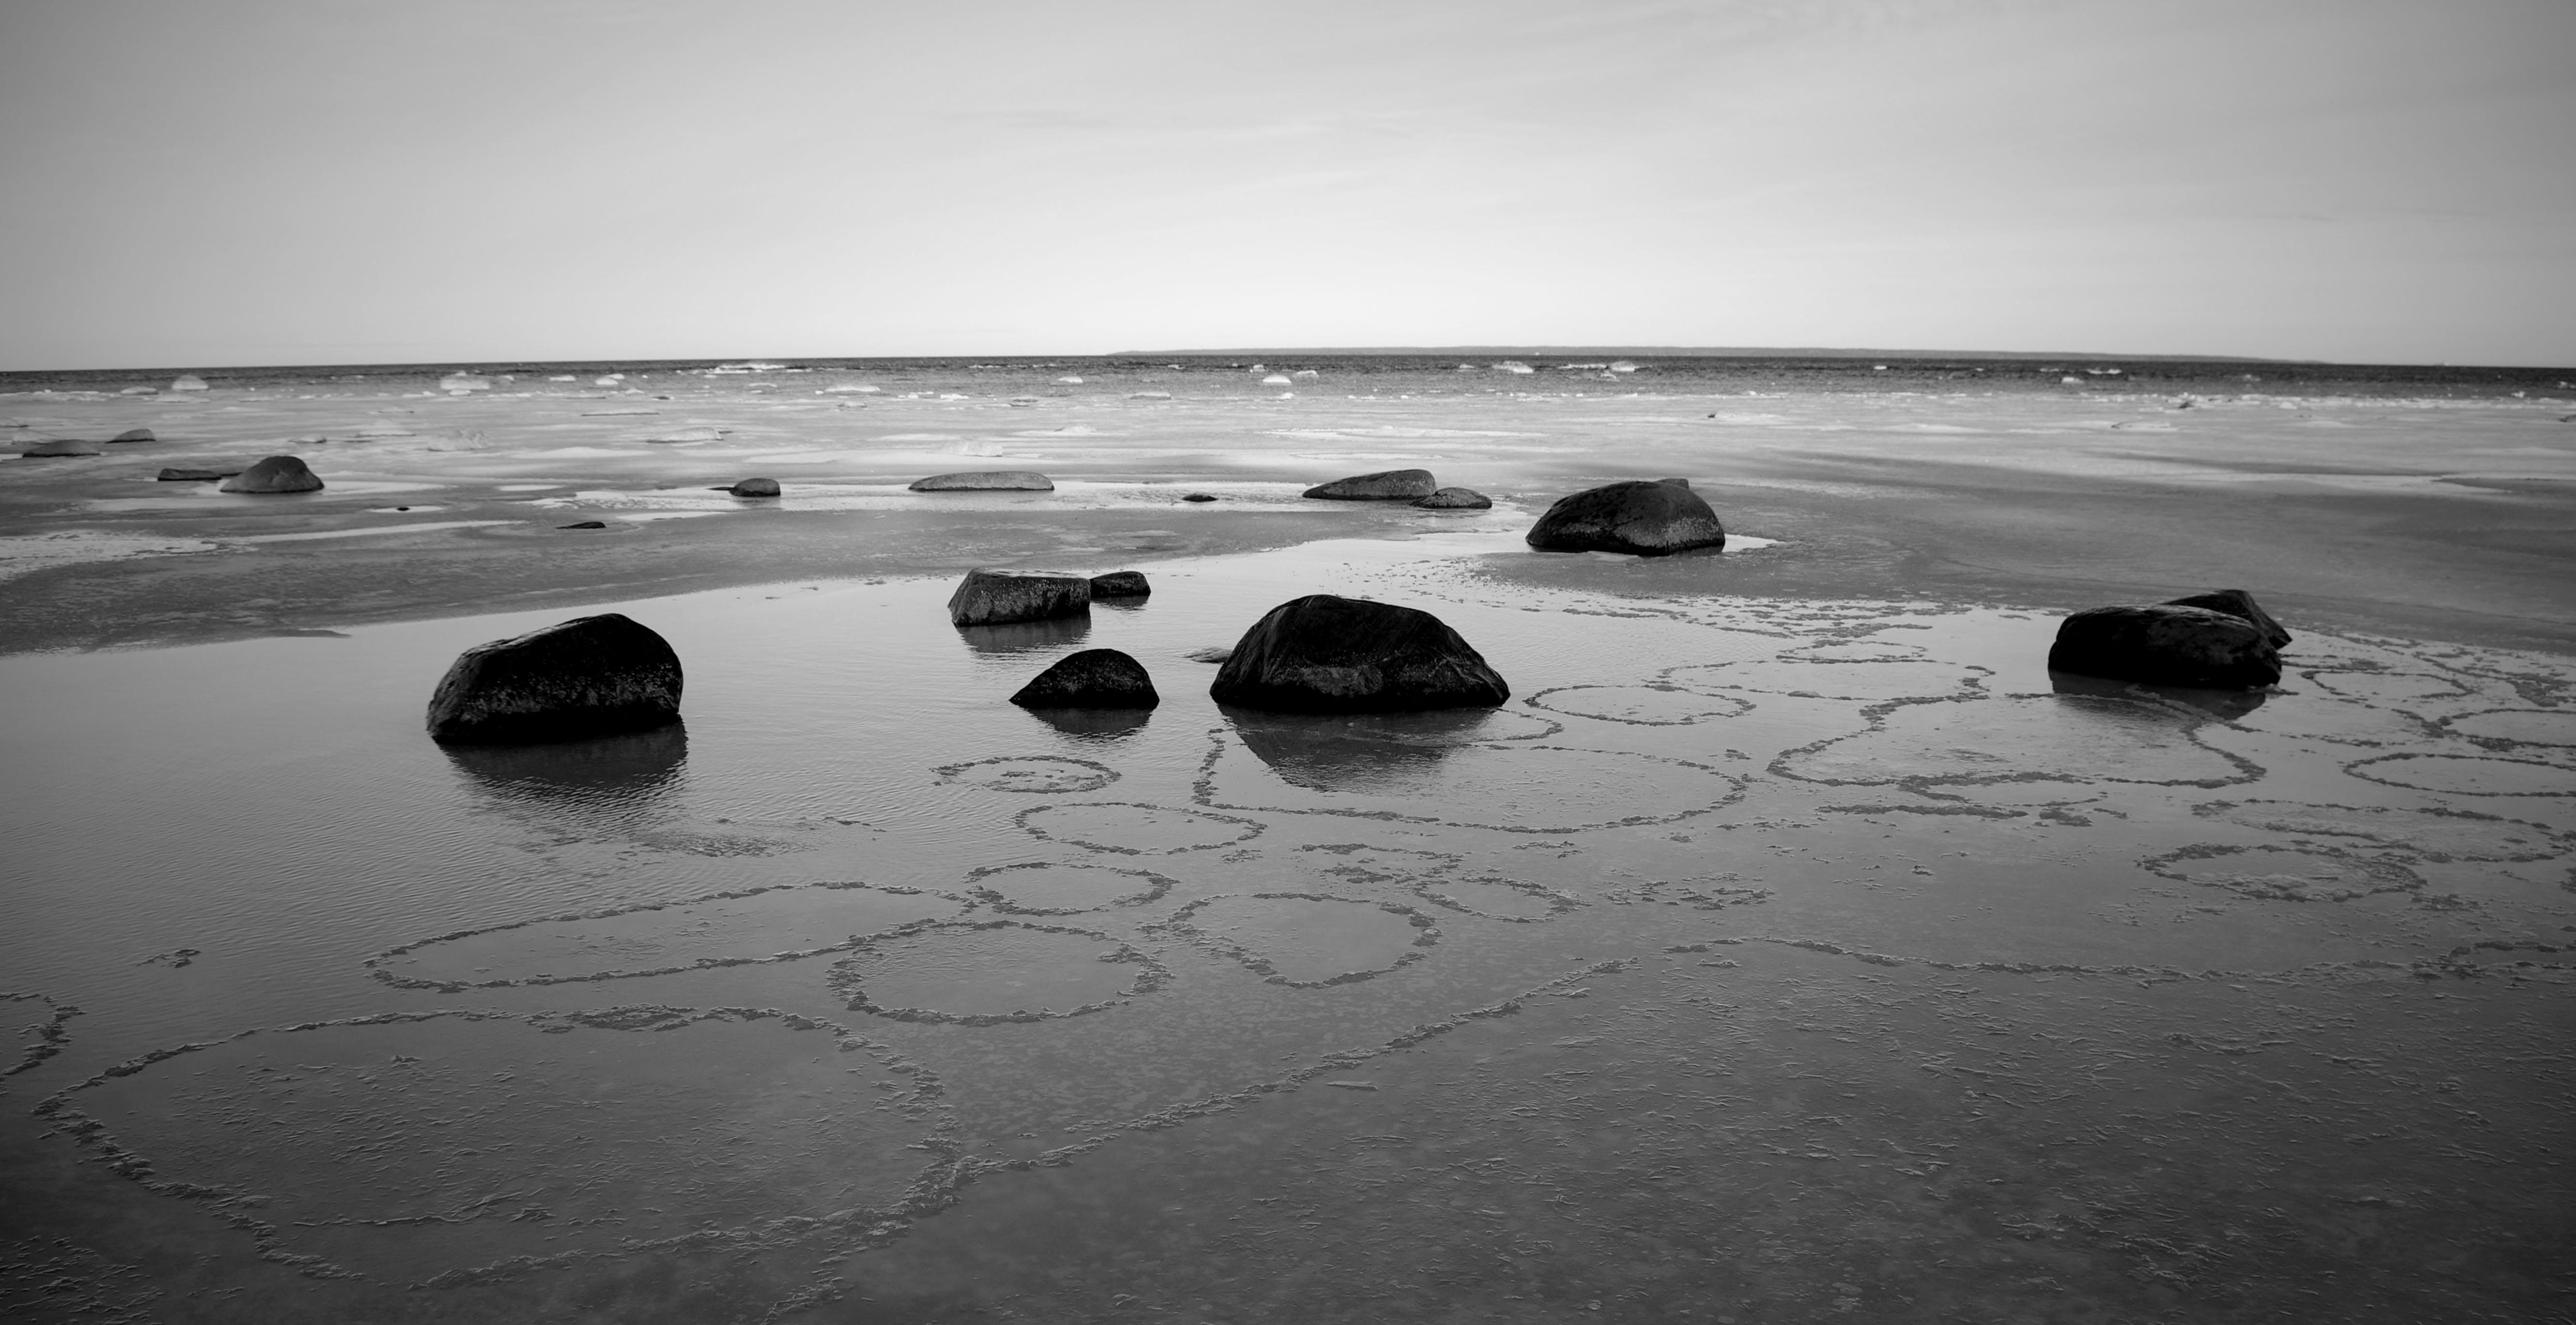 Grayscale Concrete Stones on Sand